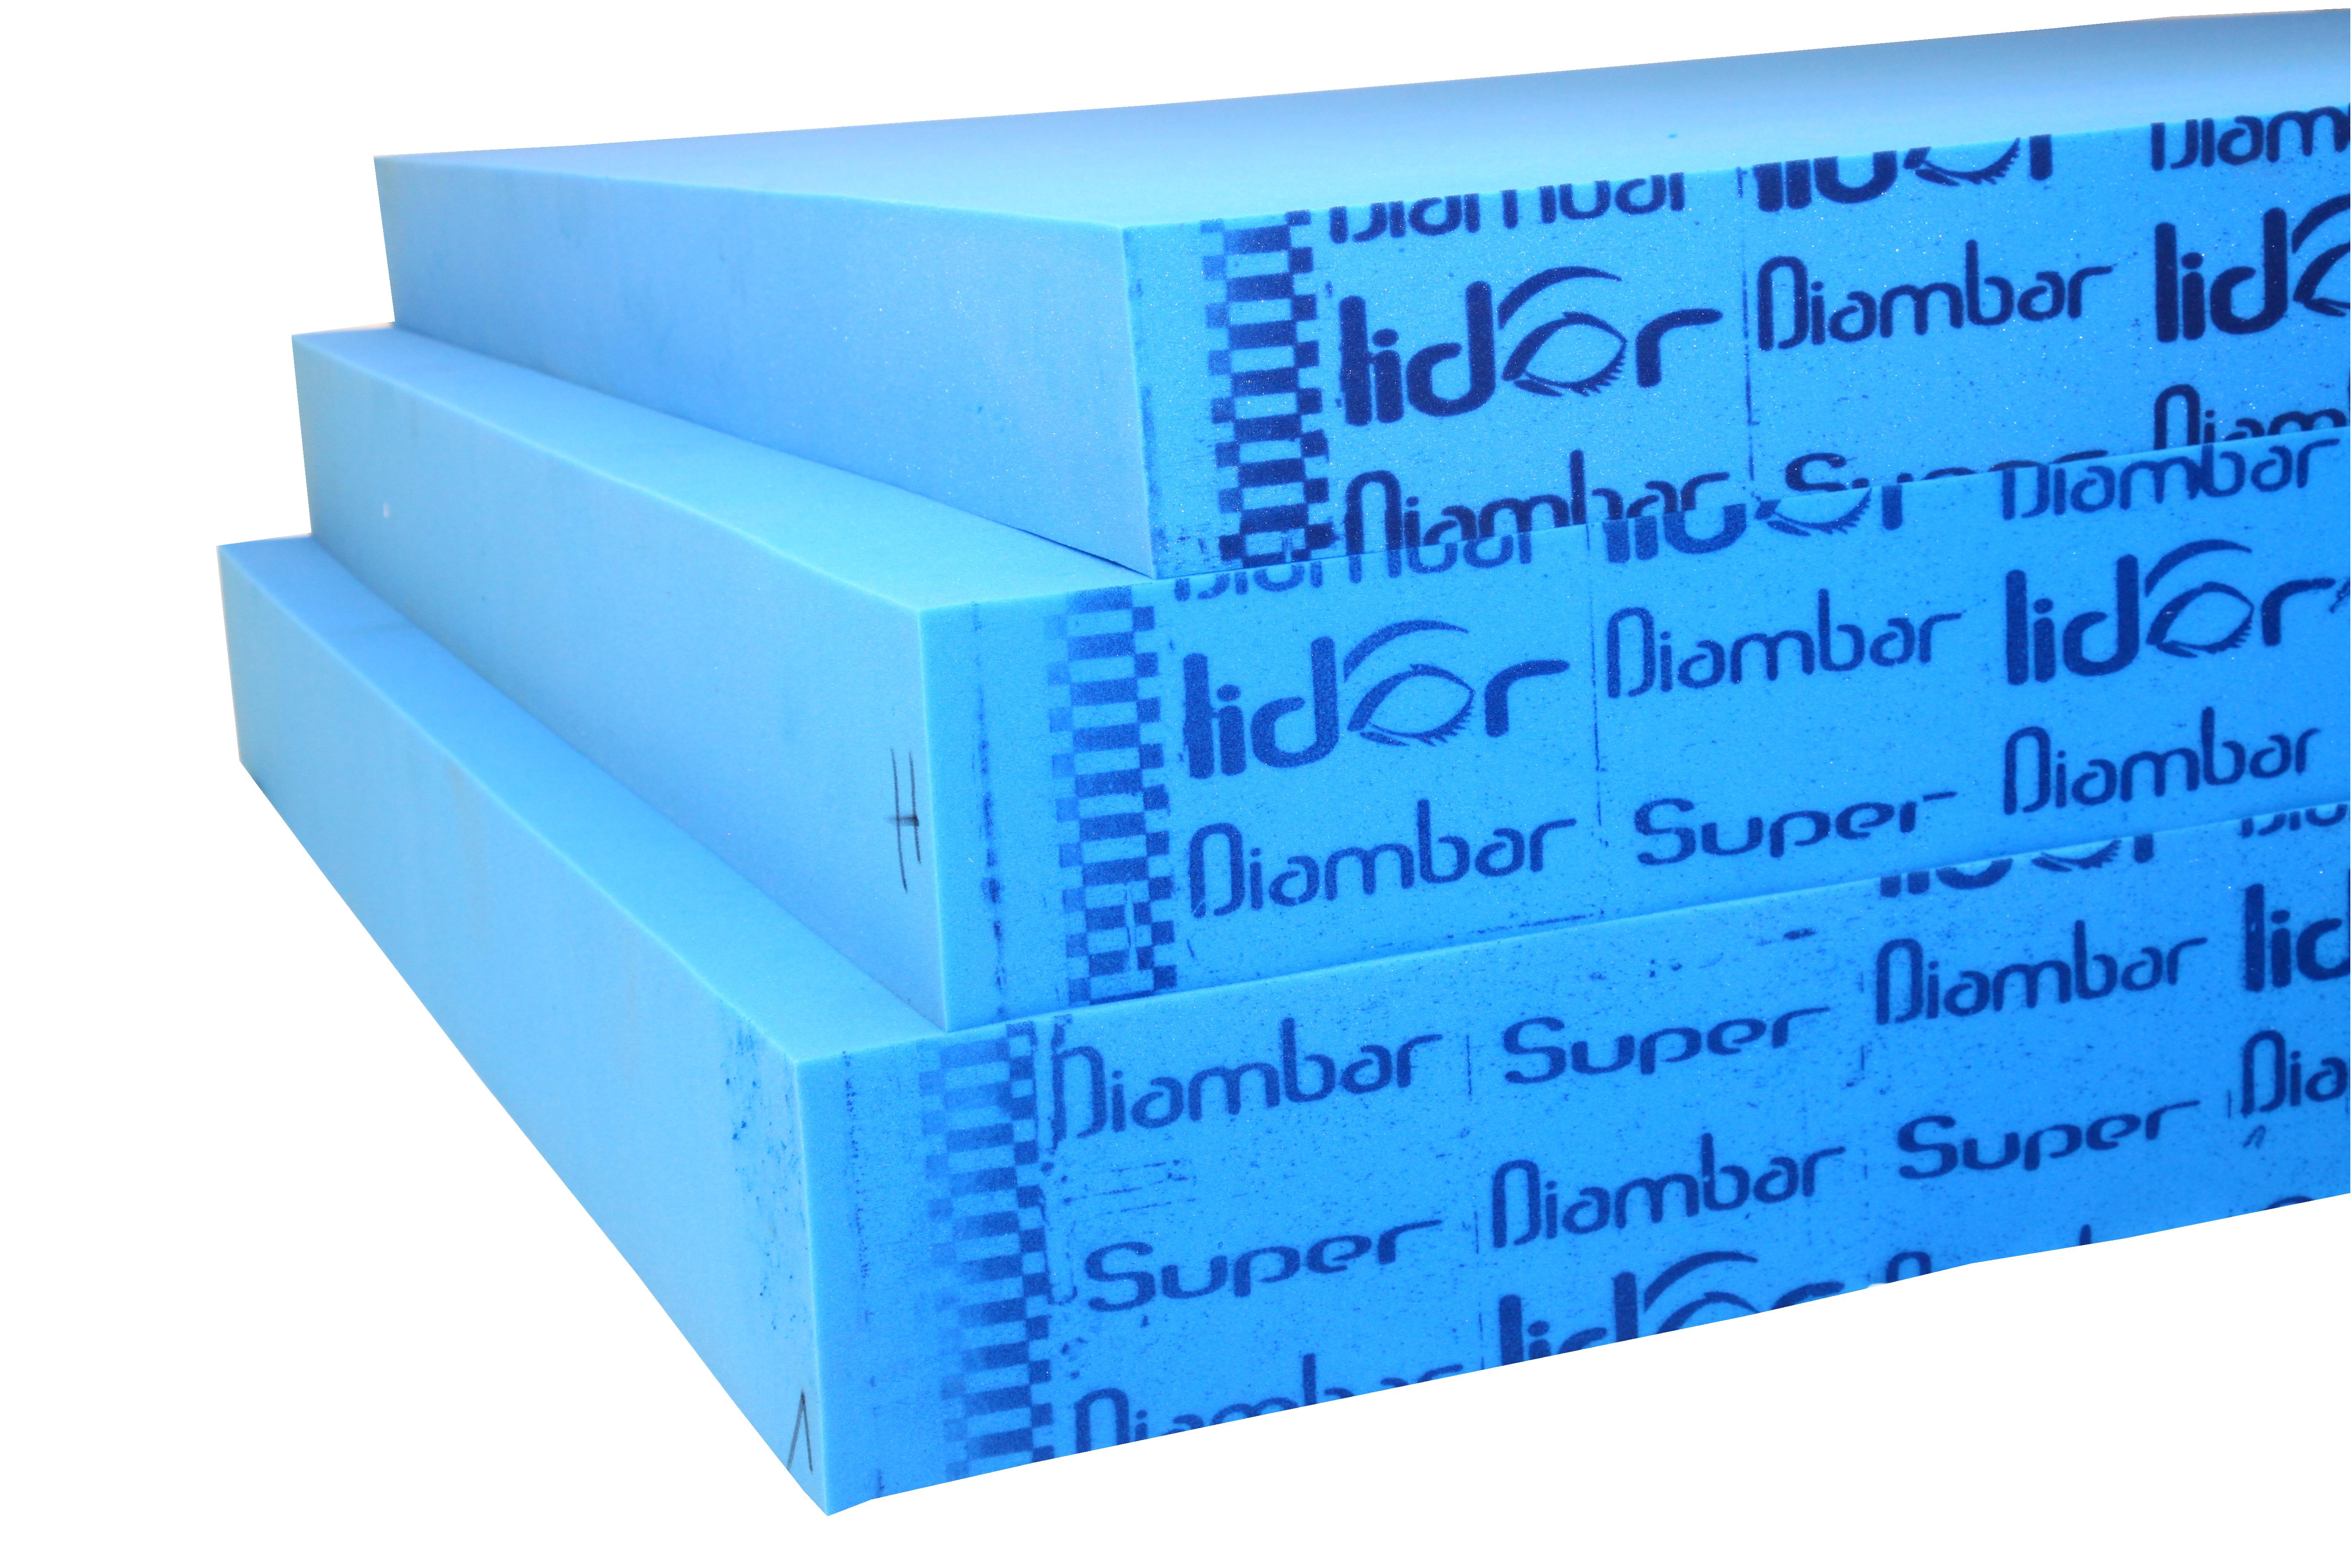 Super Diambar 190 x 180 15 -18 - 20cm